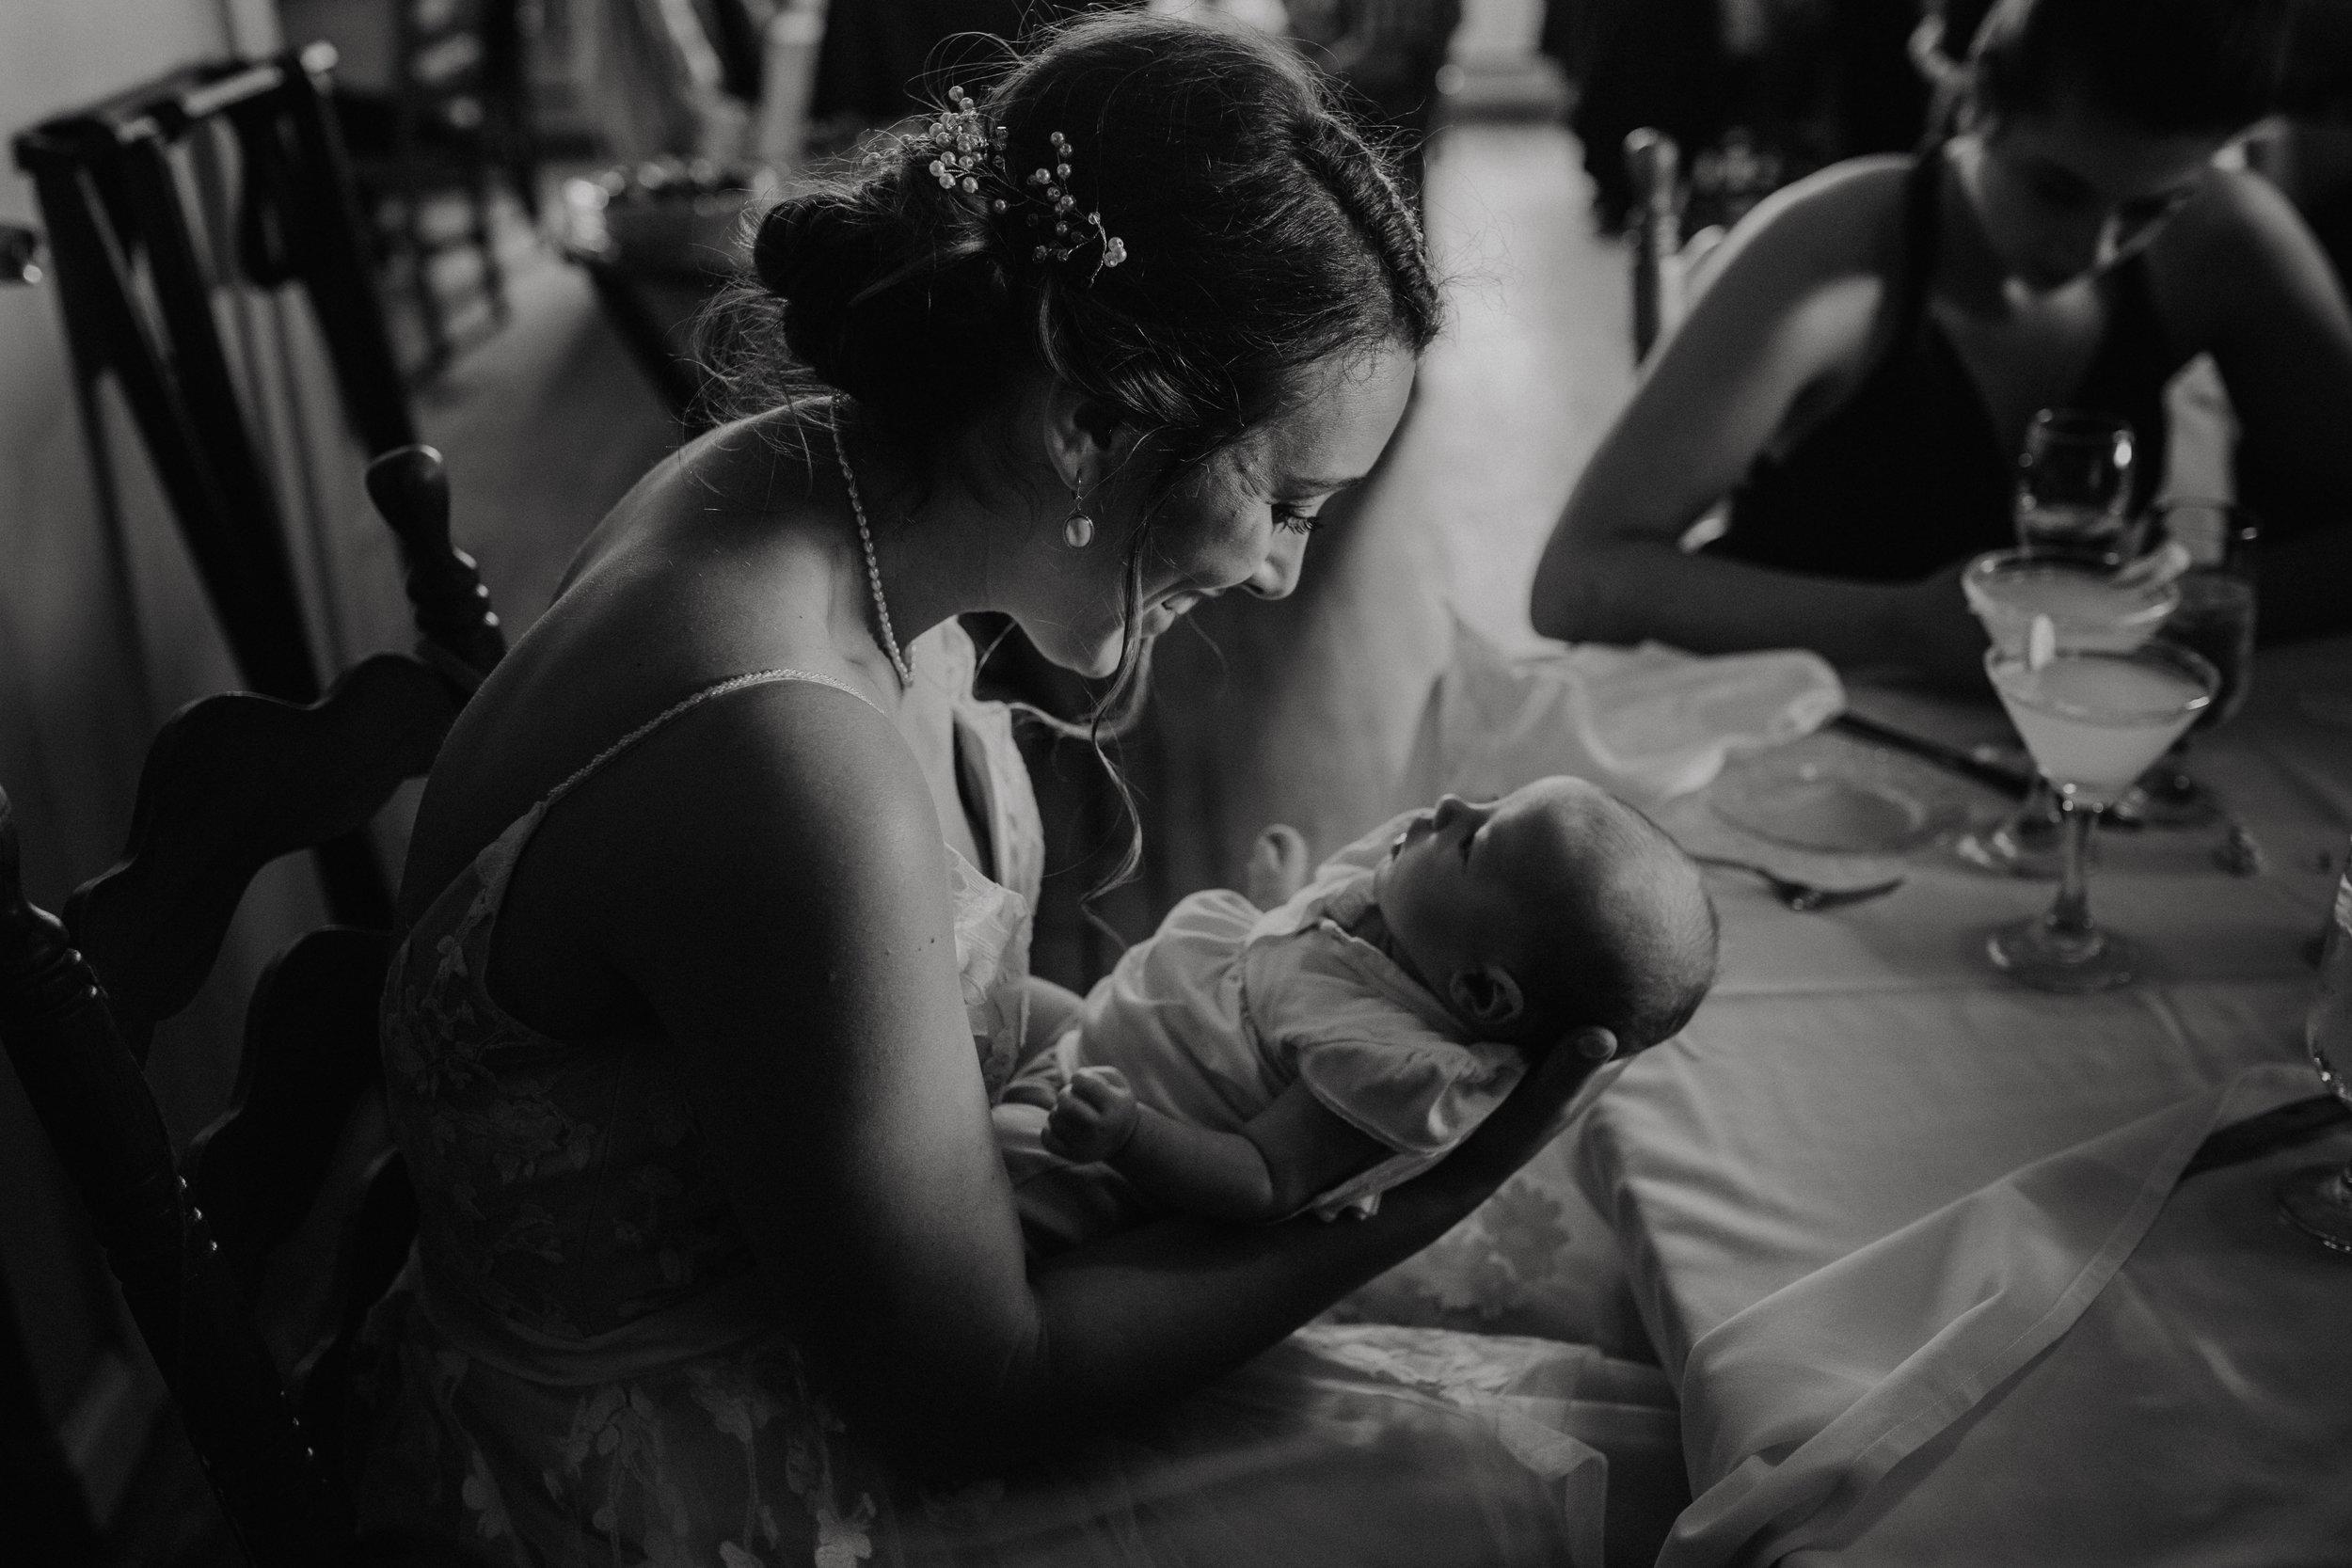 upstate_ny_wedding-54.jpg